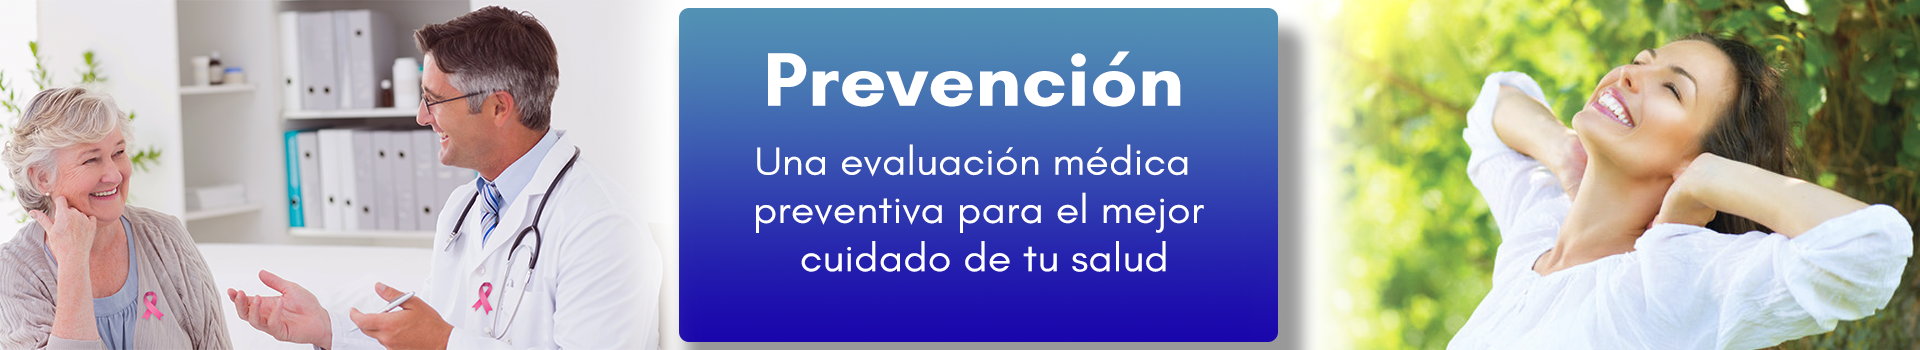 Banner Chequeos medicos